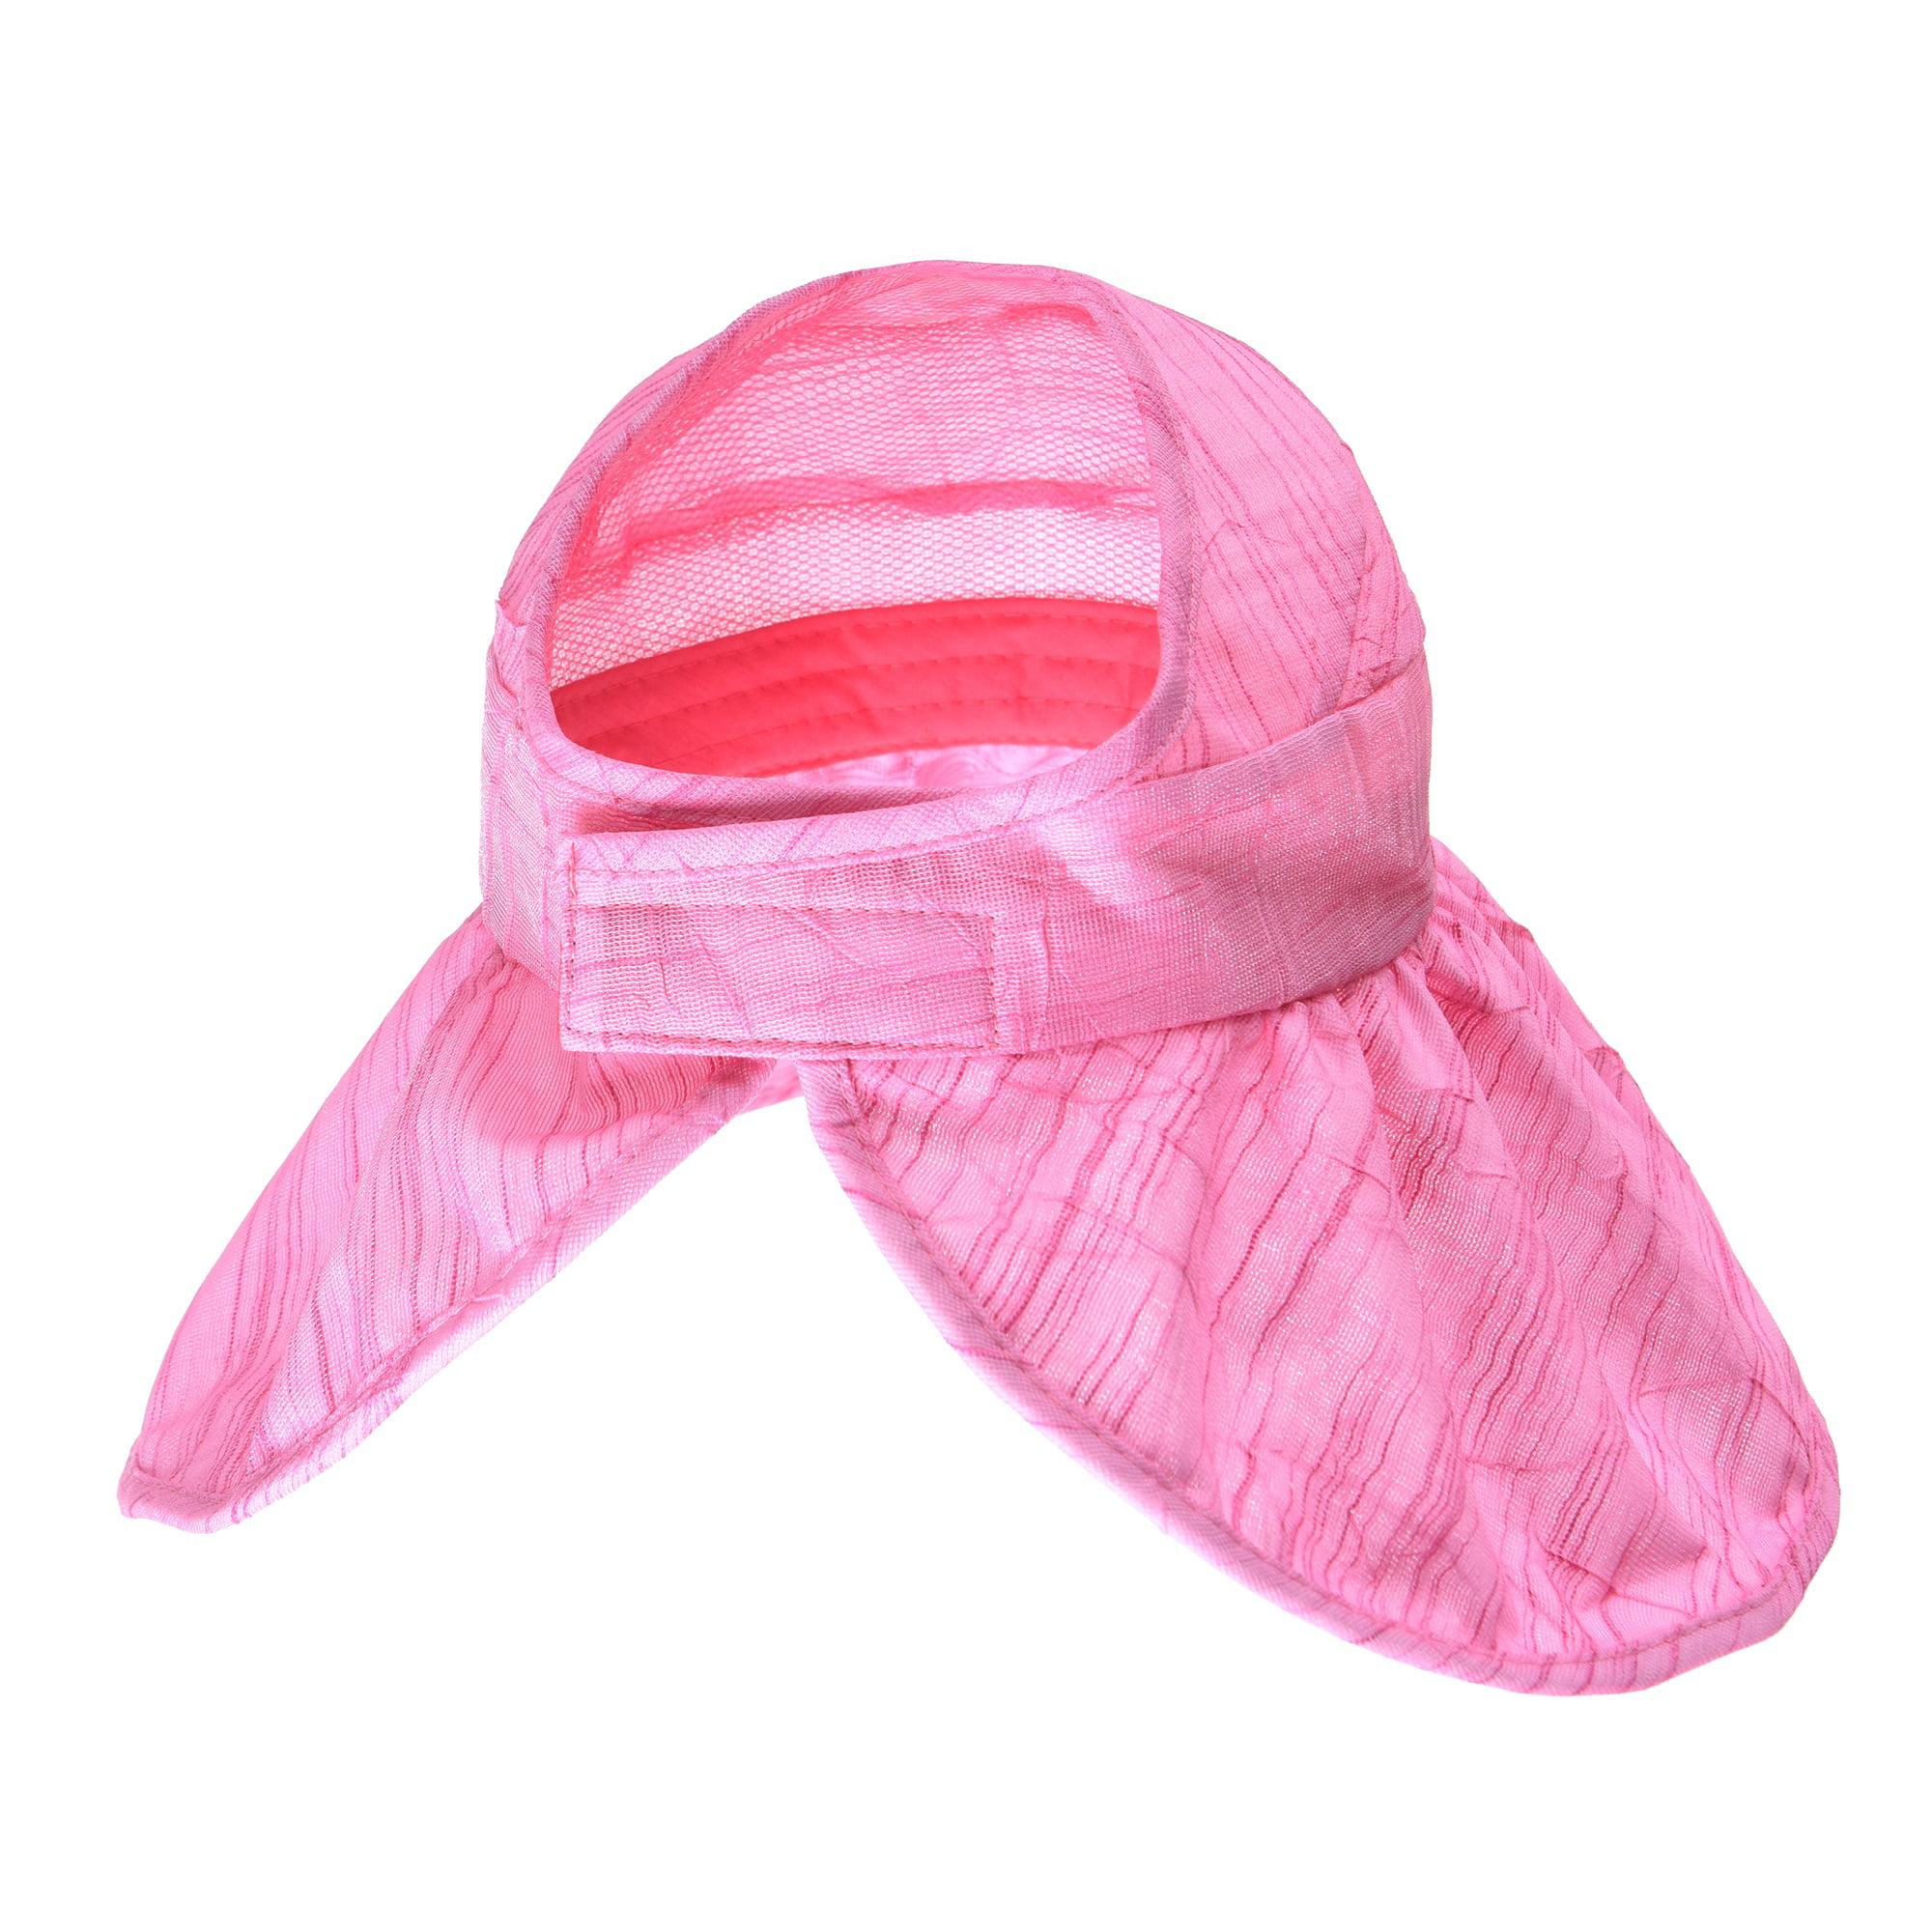 WITHMOONS - WITHMOONS Floral Ladies Sun Visor Hat with Floppy Wide Brim  SL9709 (Black) - Walmart.com 9307e94e5334